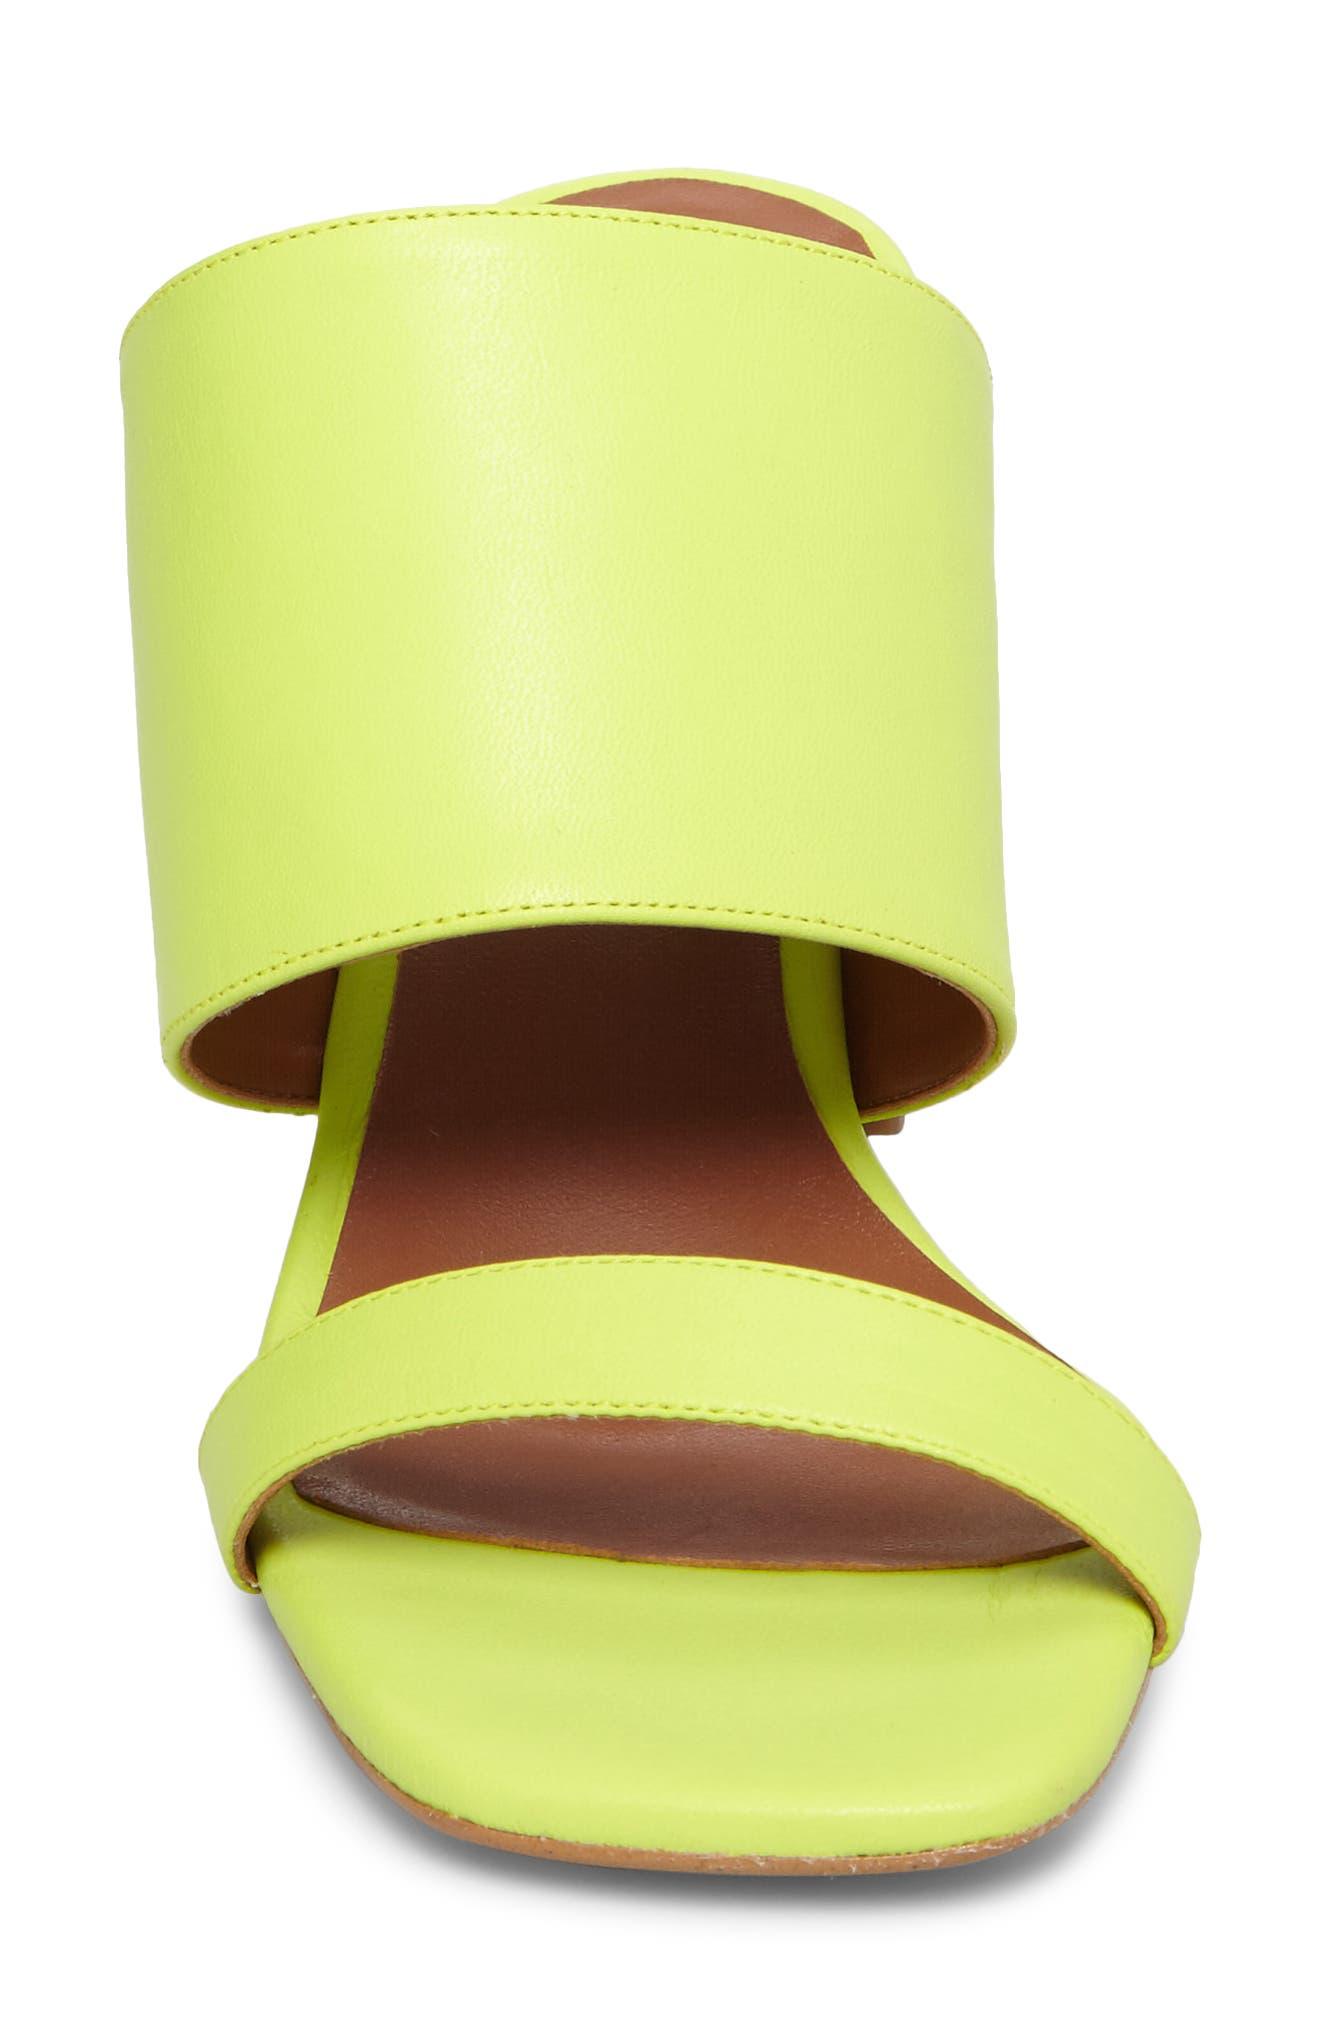 Nickle Mule Sandal,                             Alternate thumbnail 4, color,                             301